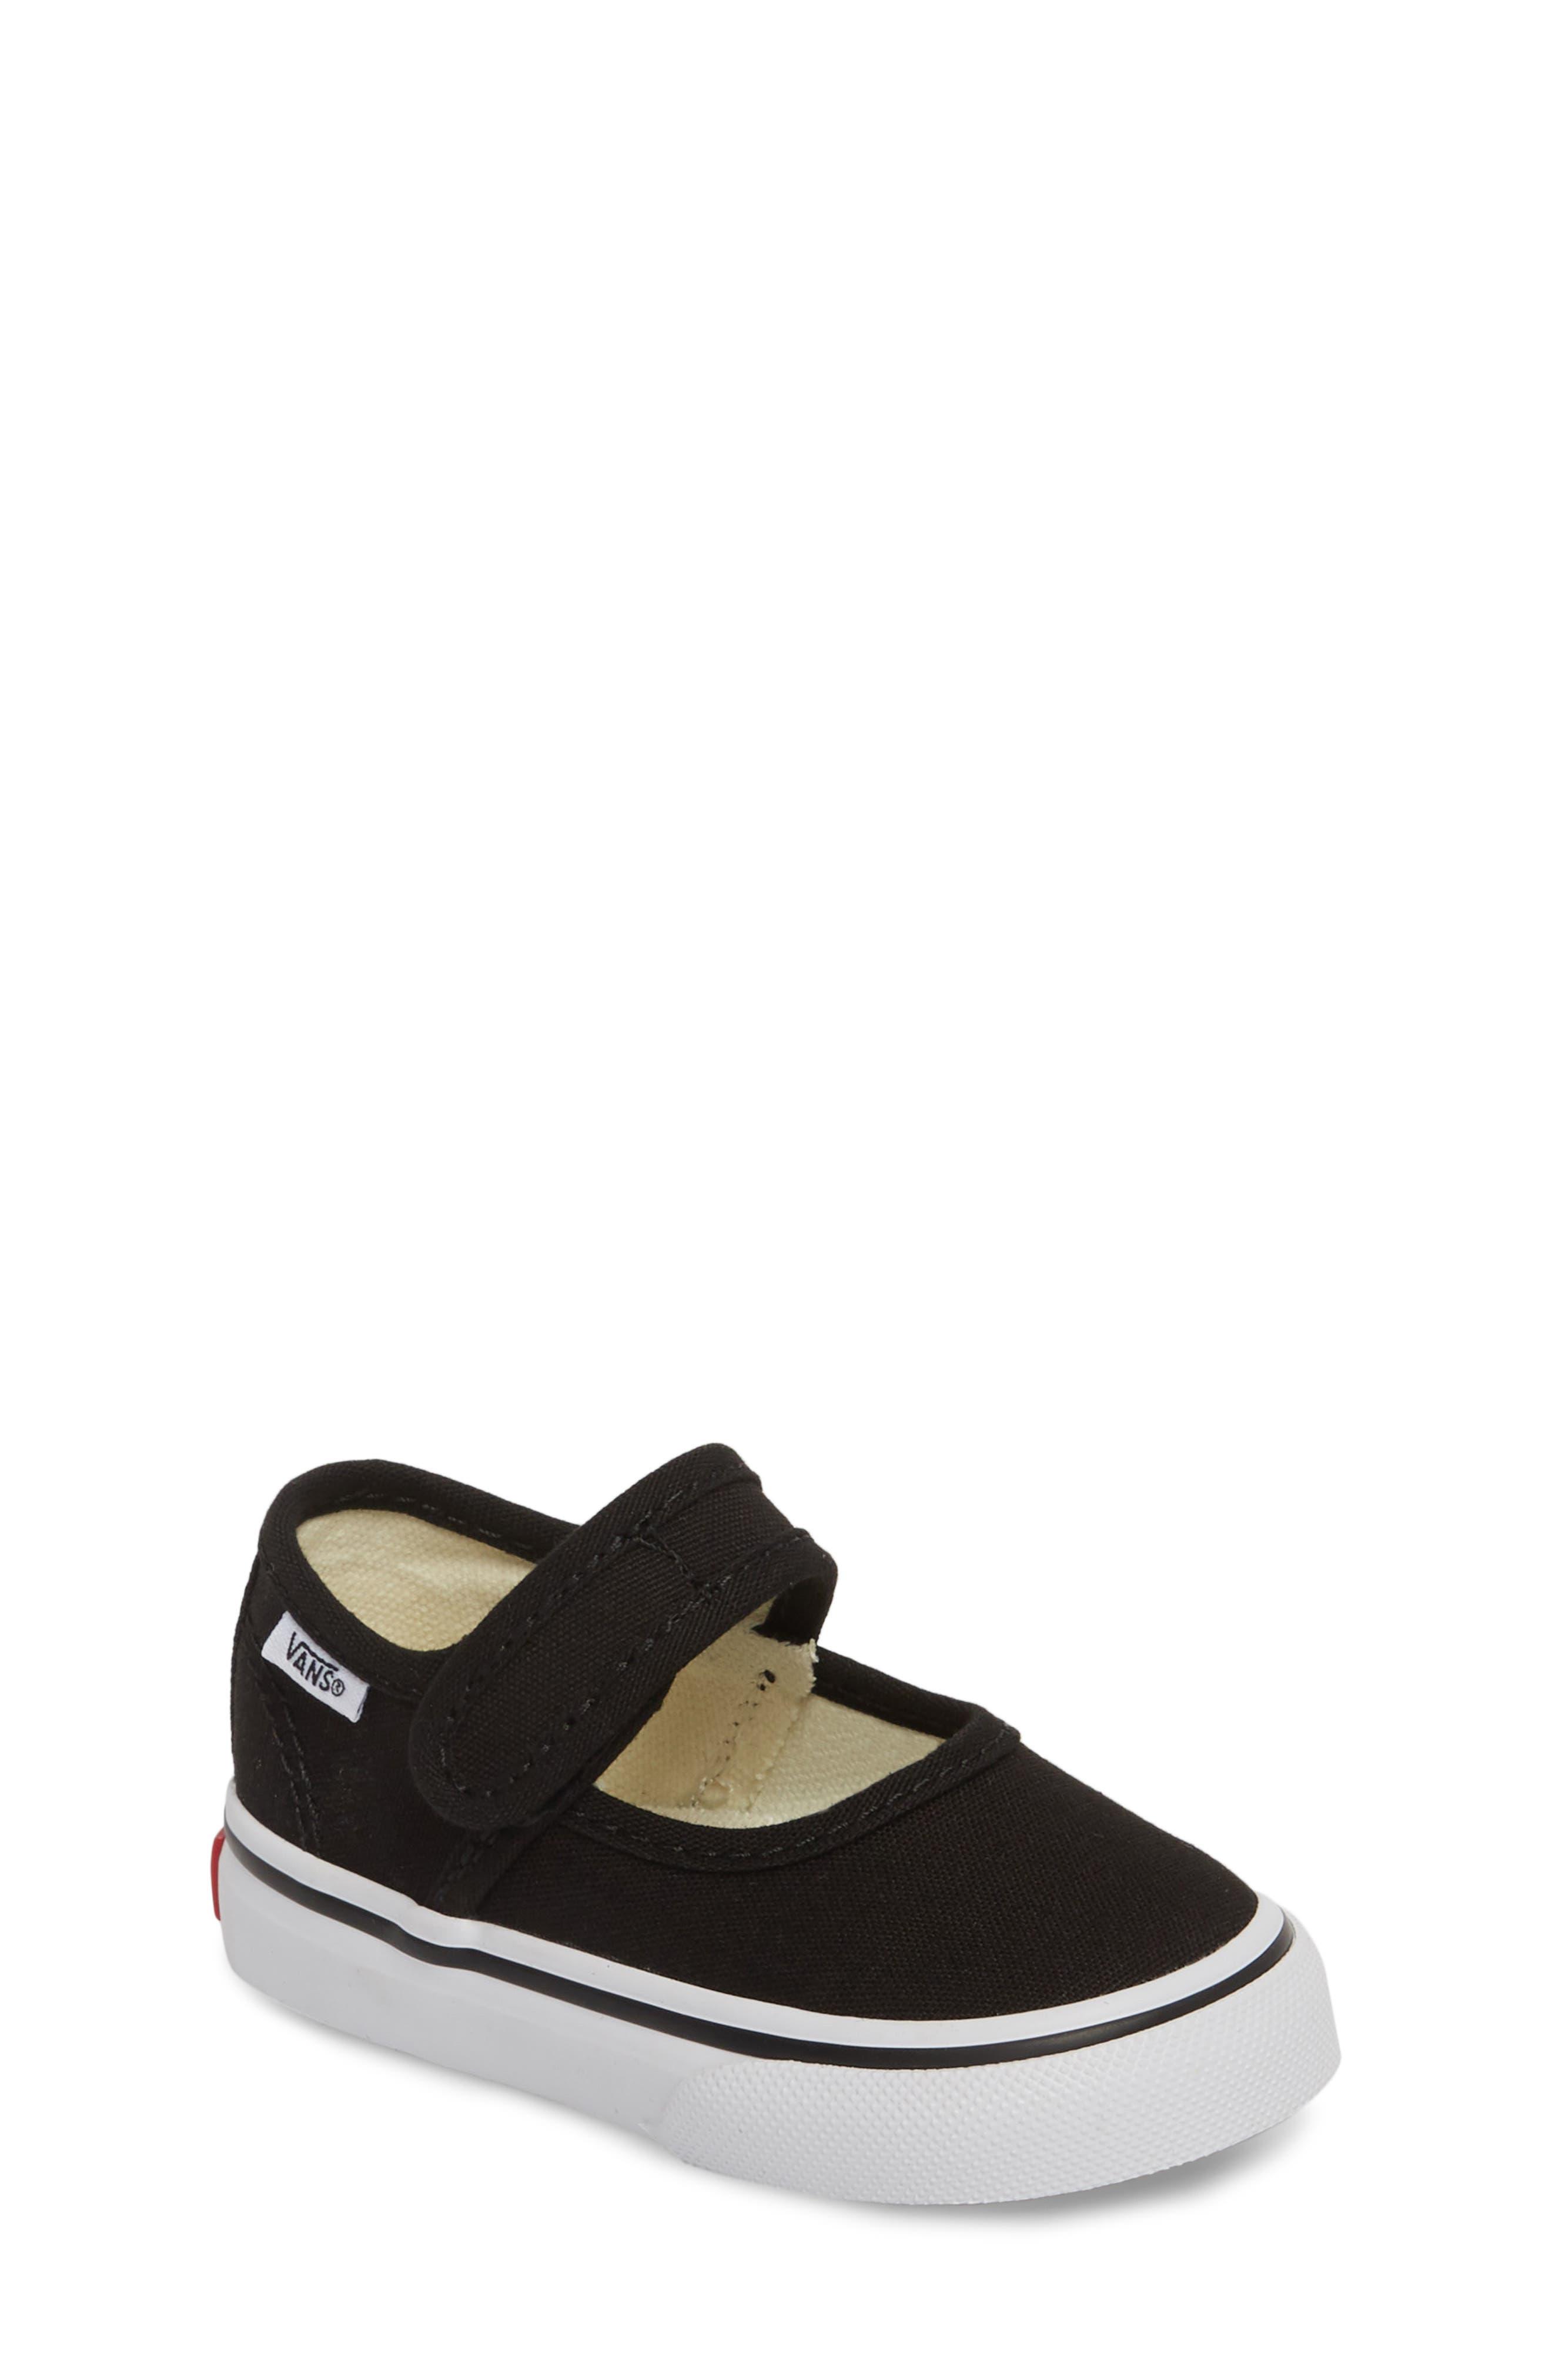 VANS,                             Mary Jane Sneaker,                             Main thumbnail 1, color,                             001